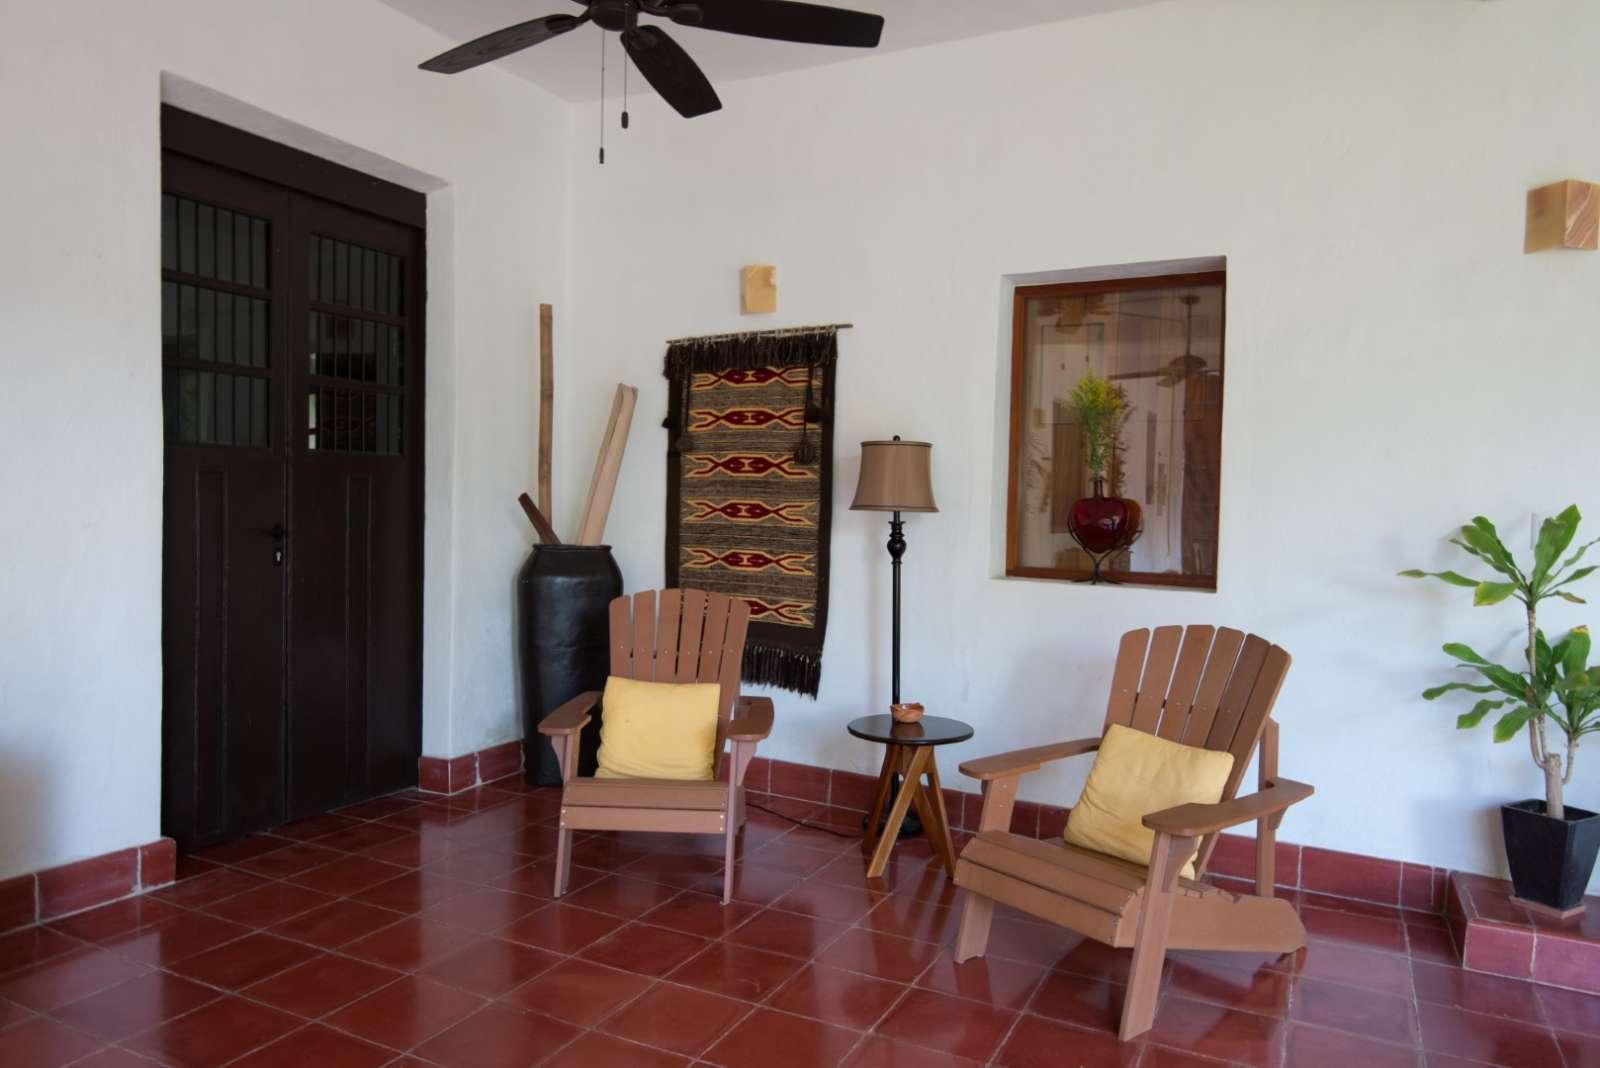 Lobby at Posada San Juan Valladolid